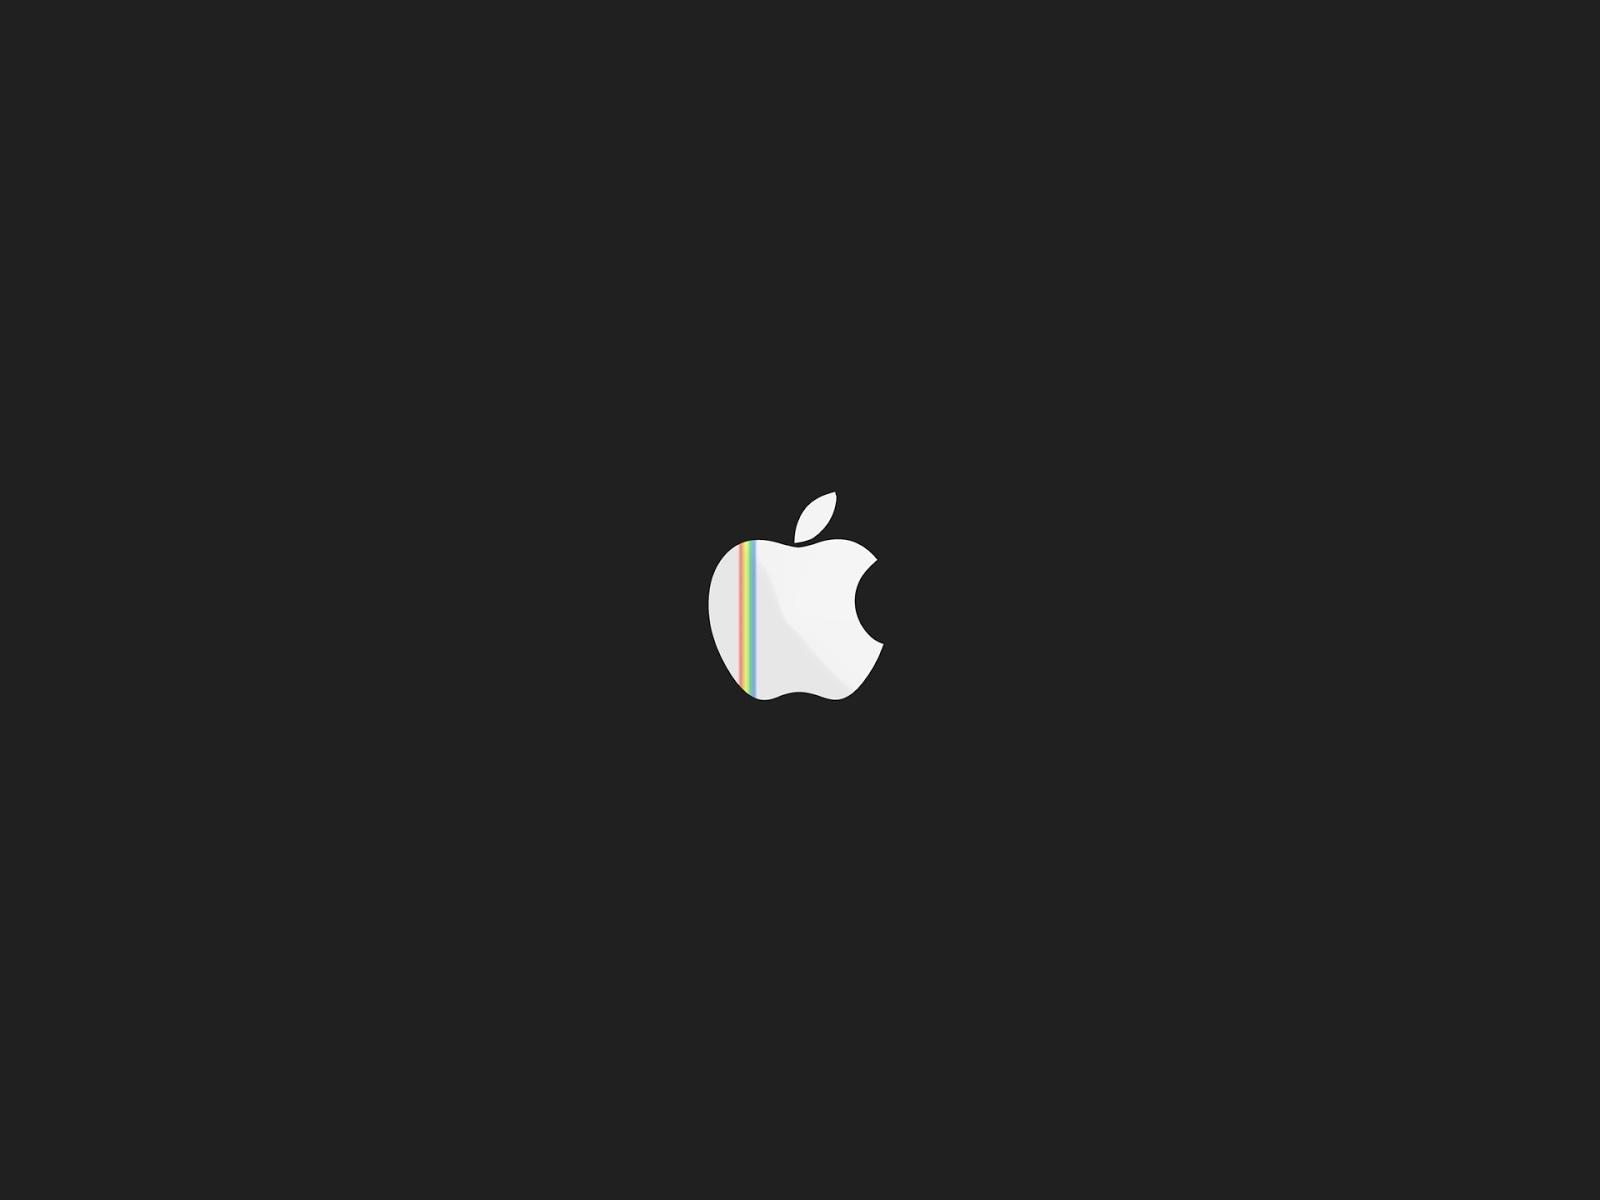 Good Wallpaper Macbook Minimalist - apple-minimalist-logo-mac-wallpaper  Perfect Image Reference_52050.jpg